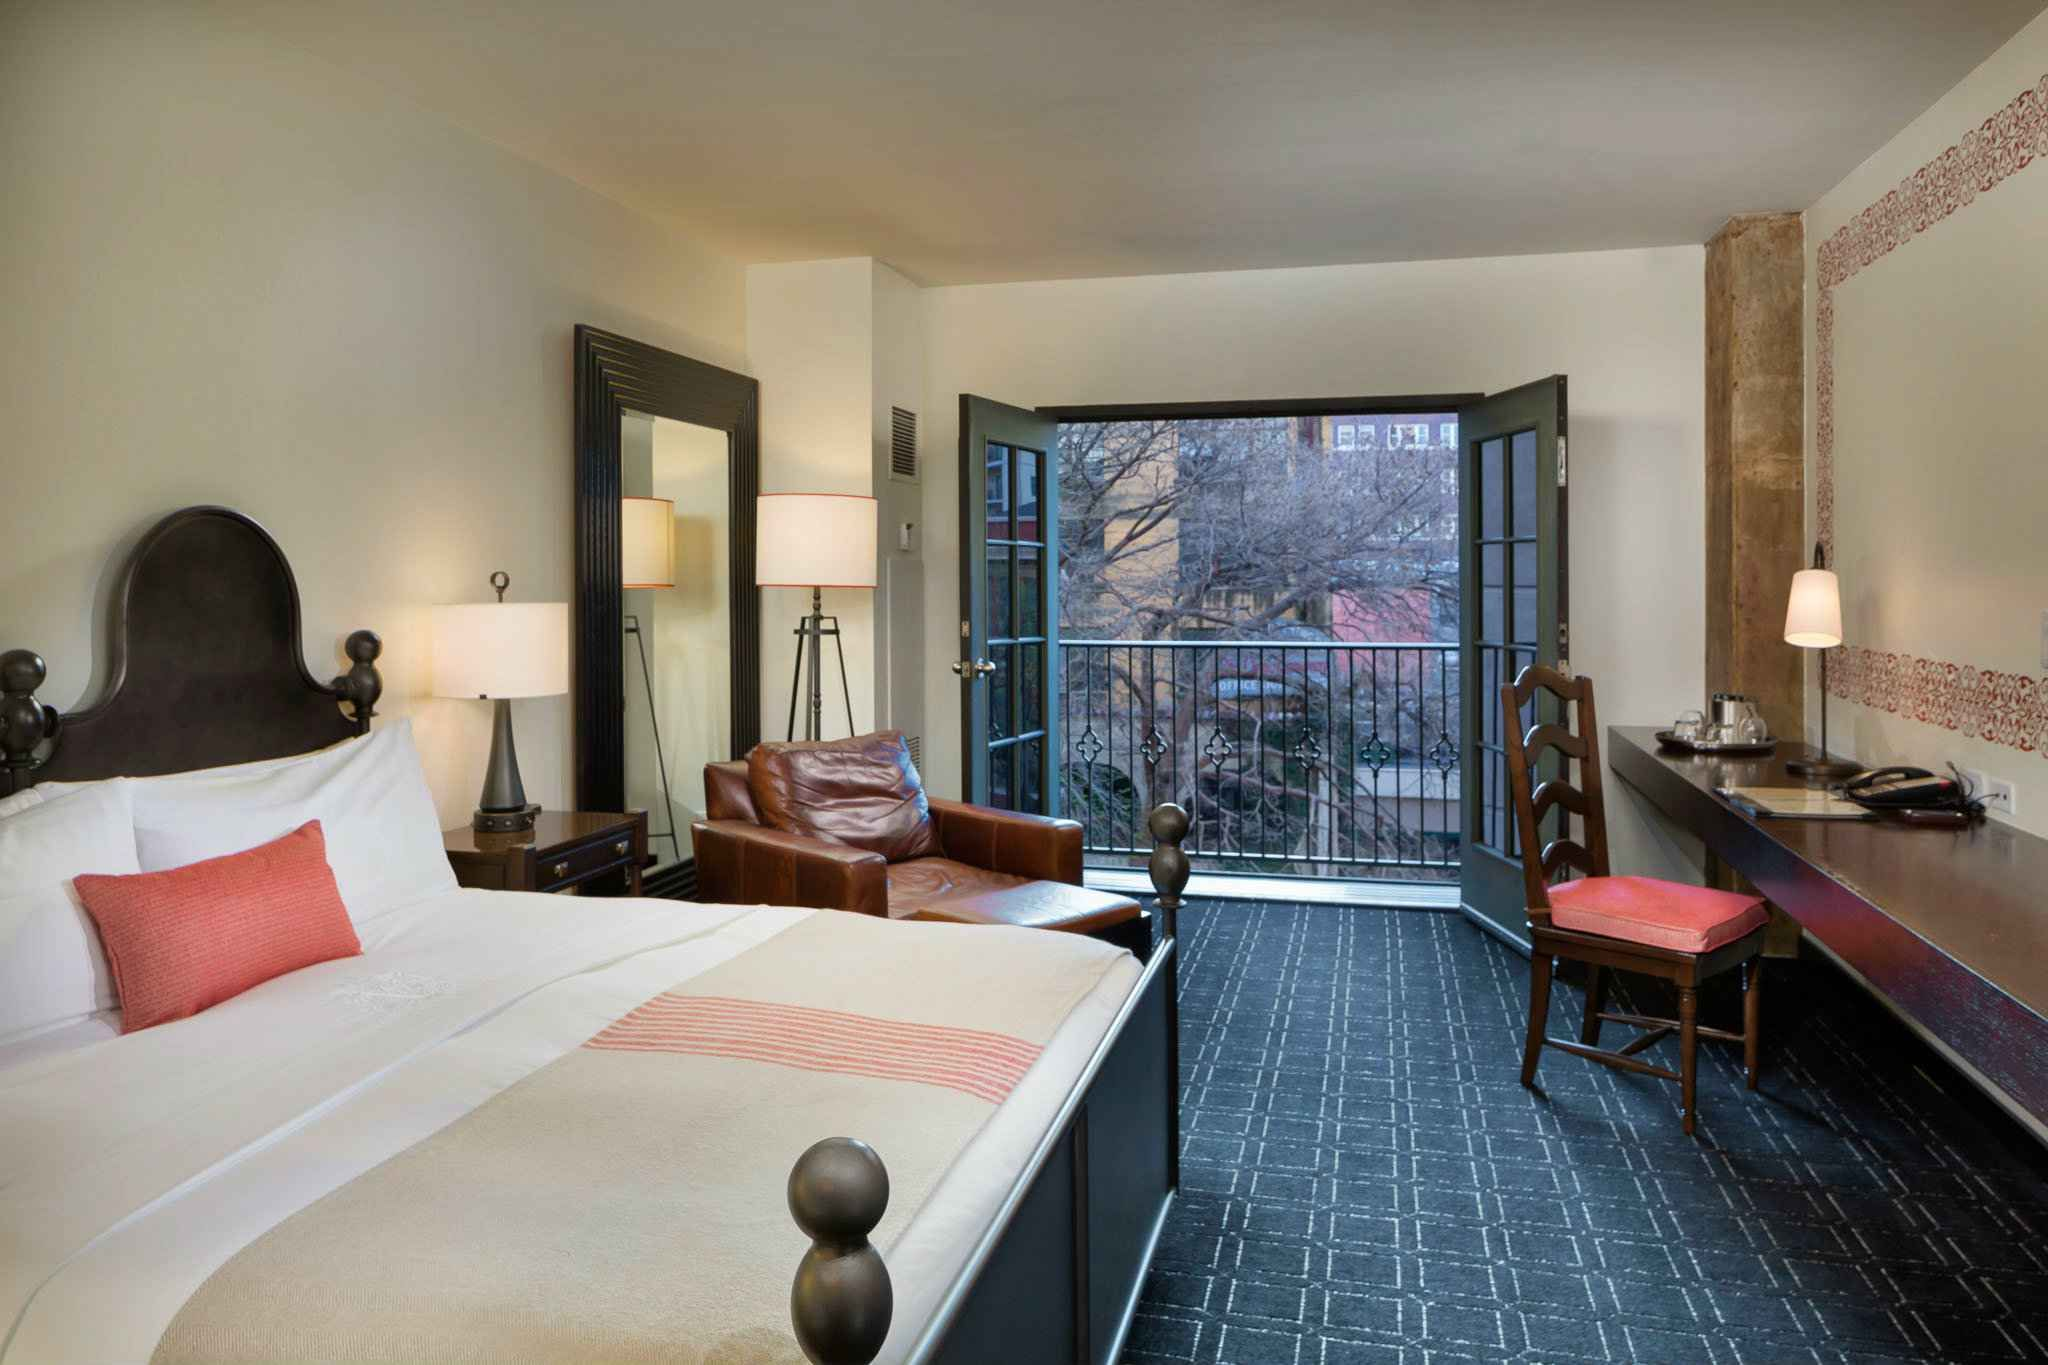 Hotel Valencia Riverwalk King Juliette Balcony Room Over